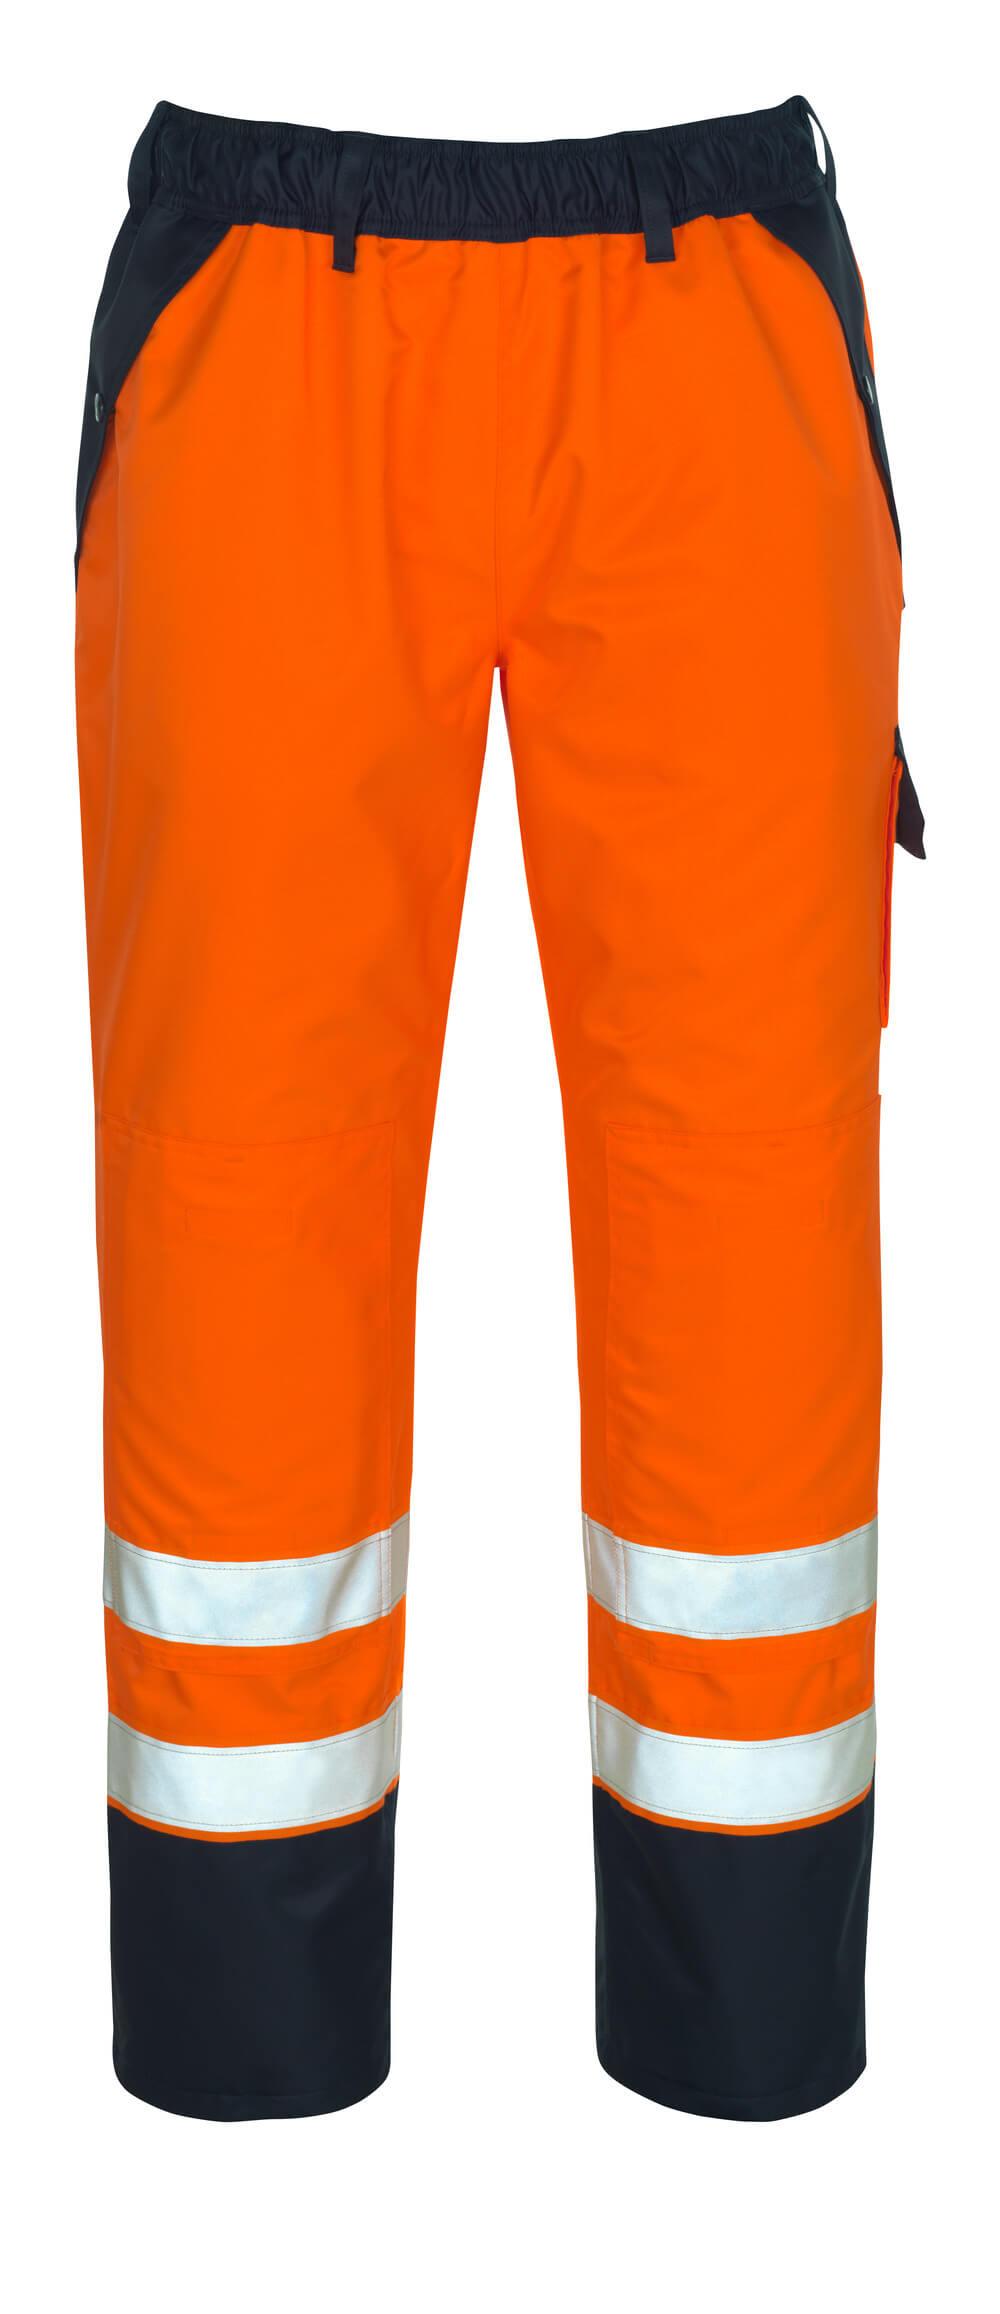 07090-880-141 Overtræksbukser - hi-vis orange/marine